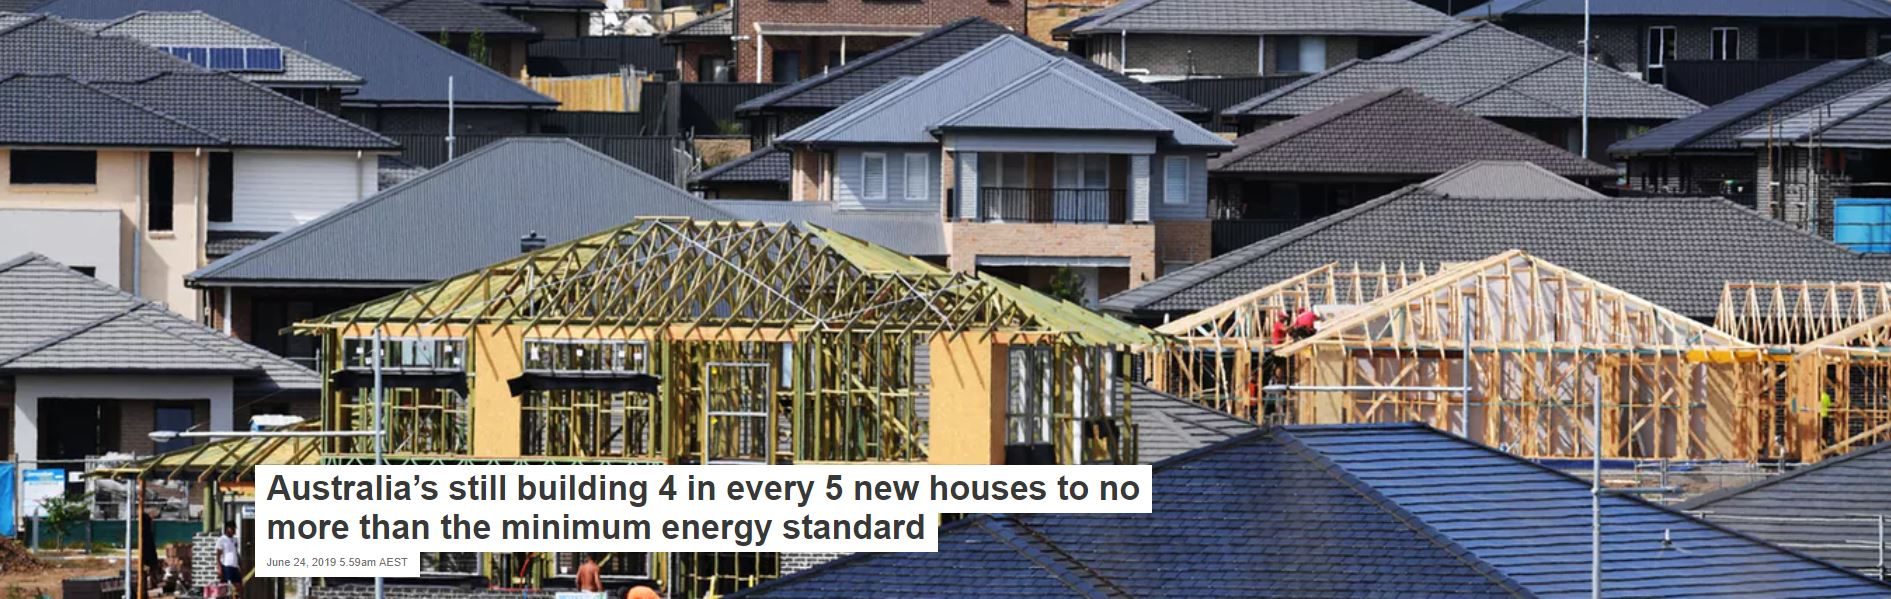 Energy Standard.JPG